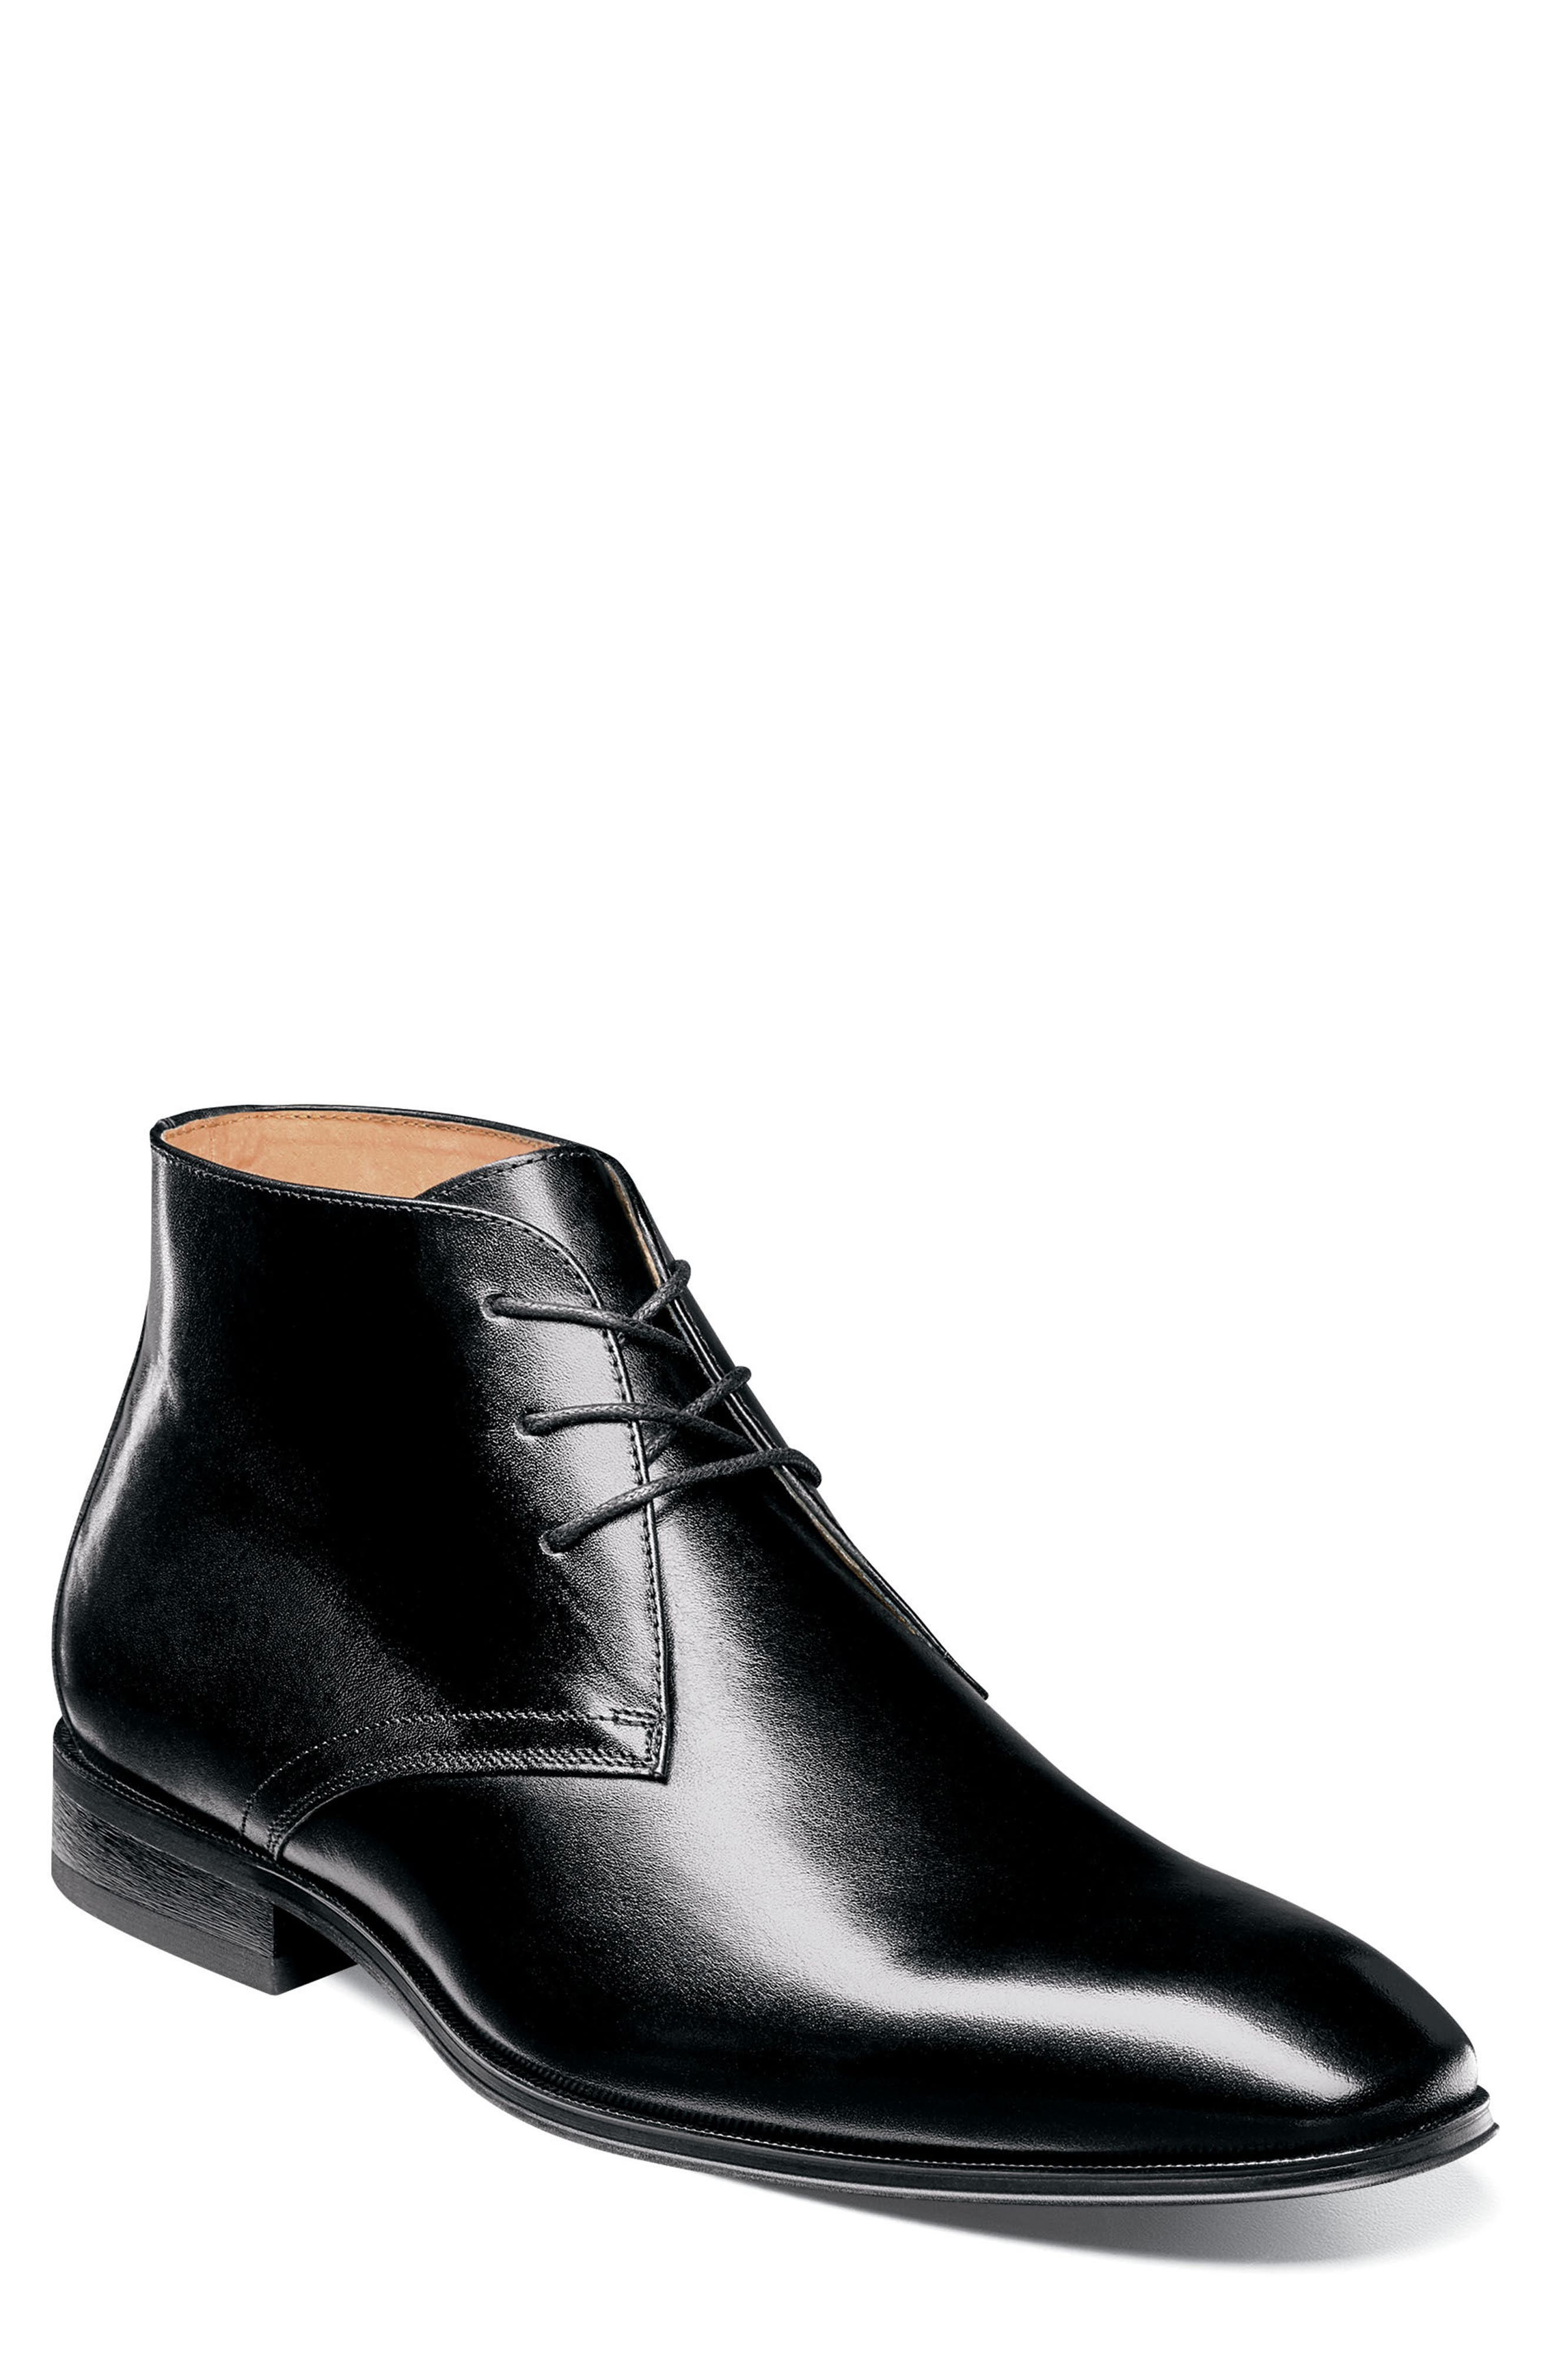 Corbetta Chukka Boot,                         Main,                         color, 001